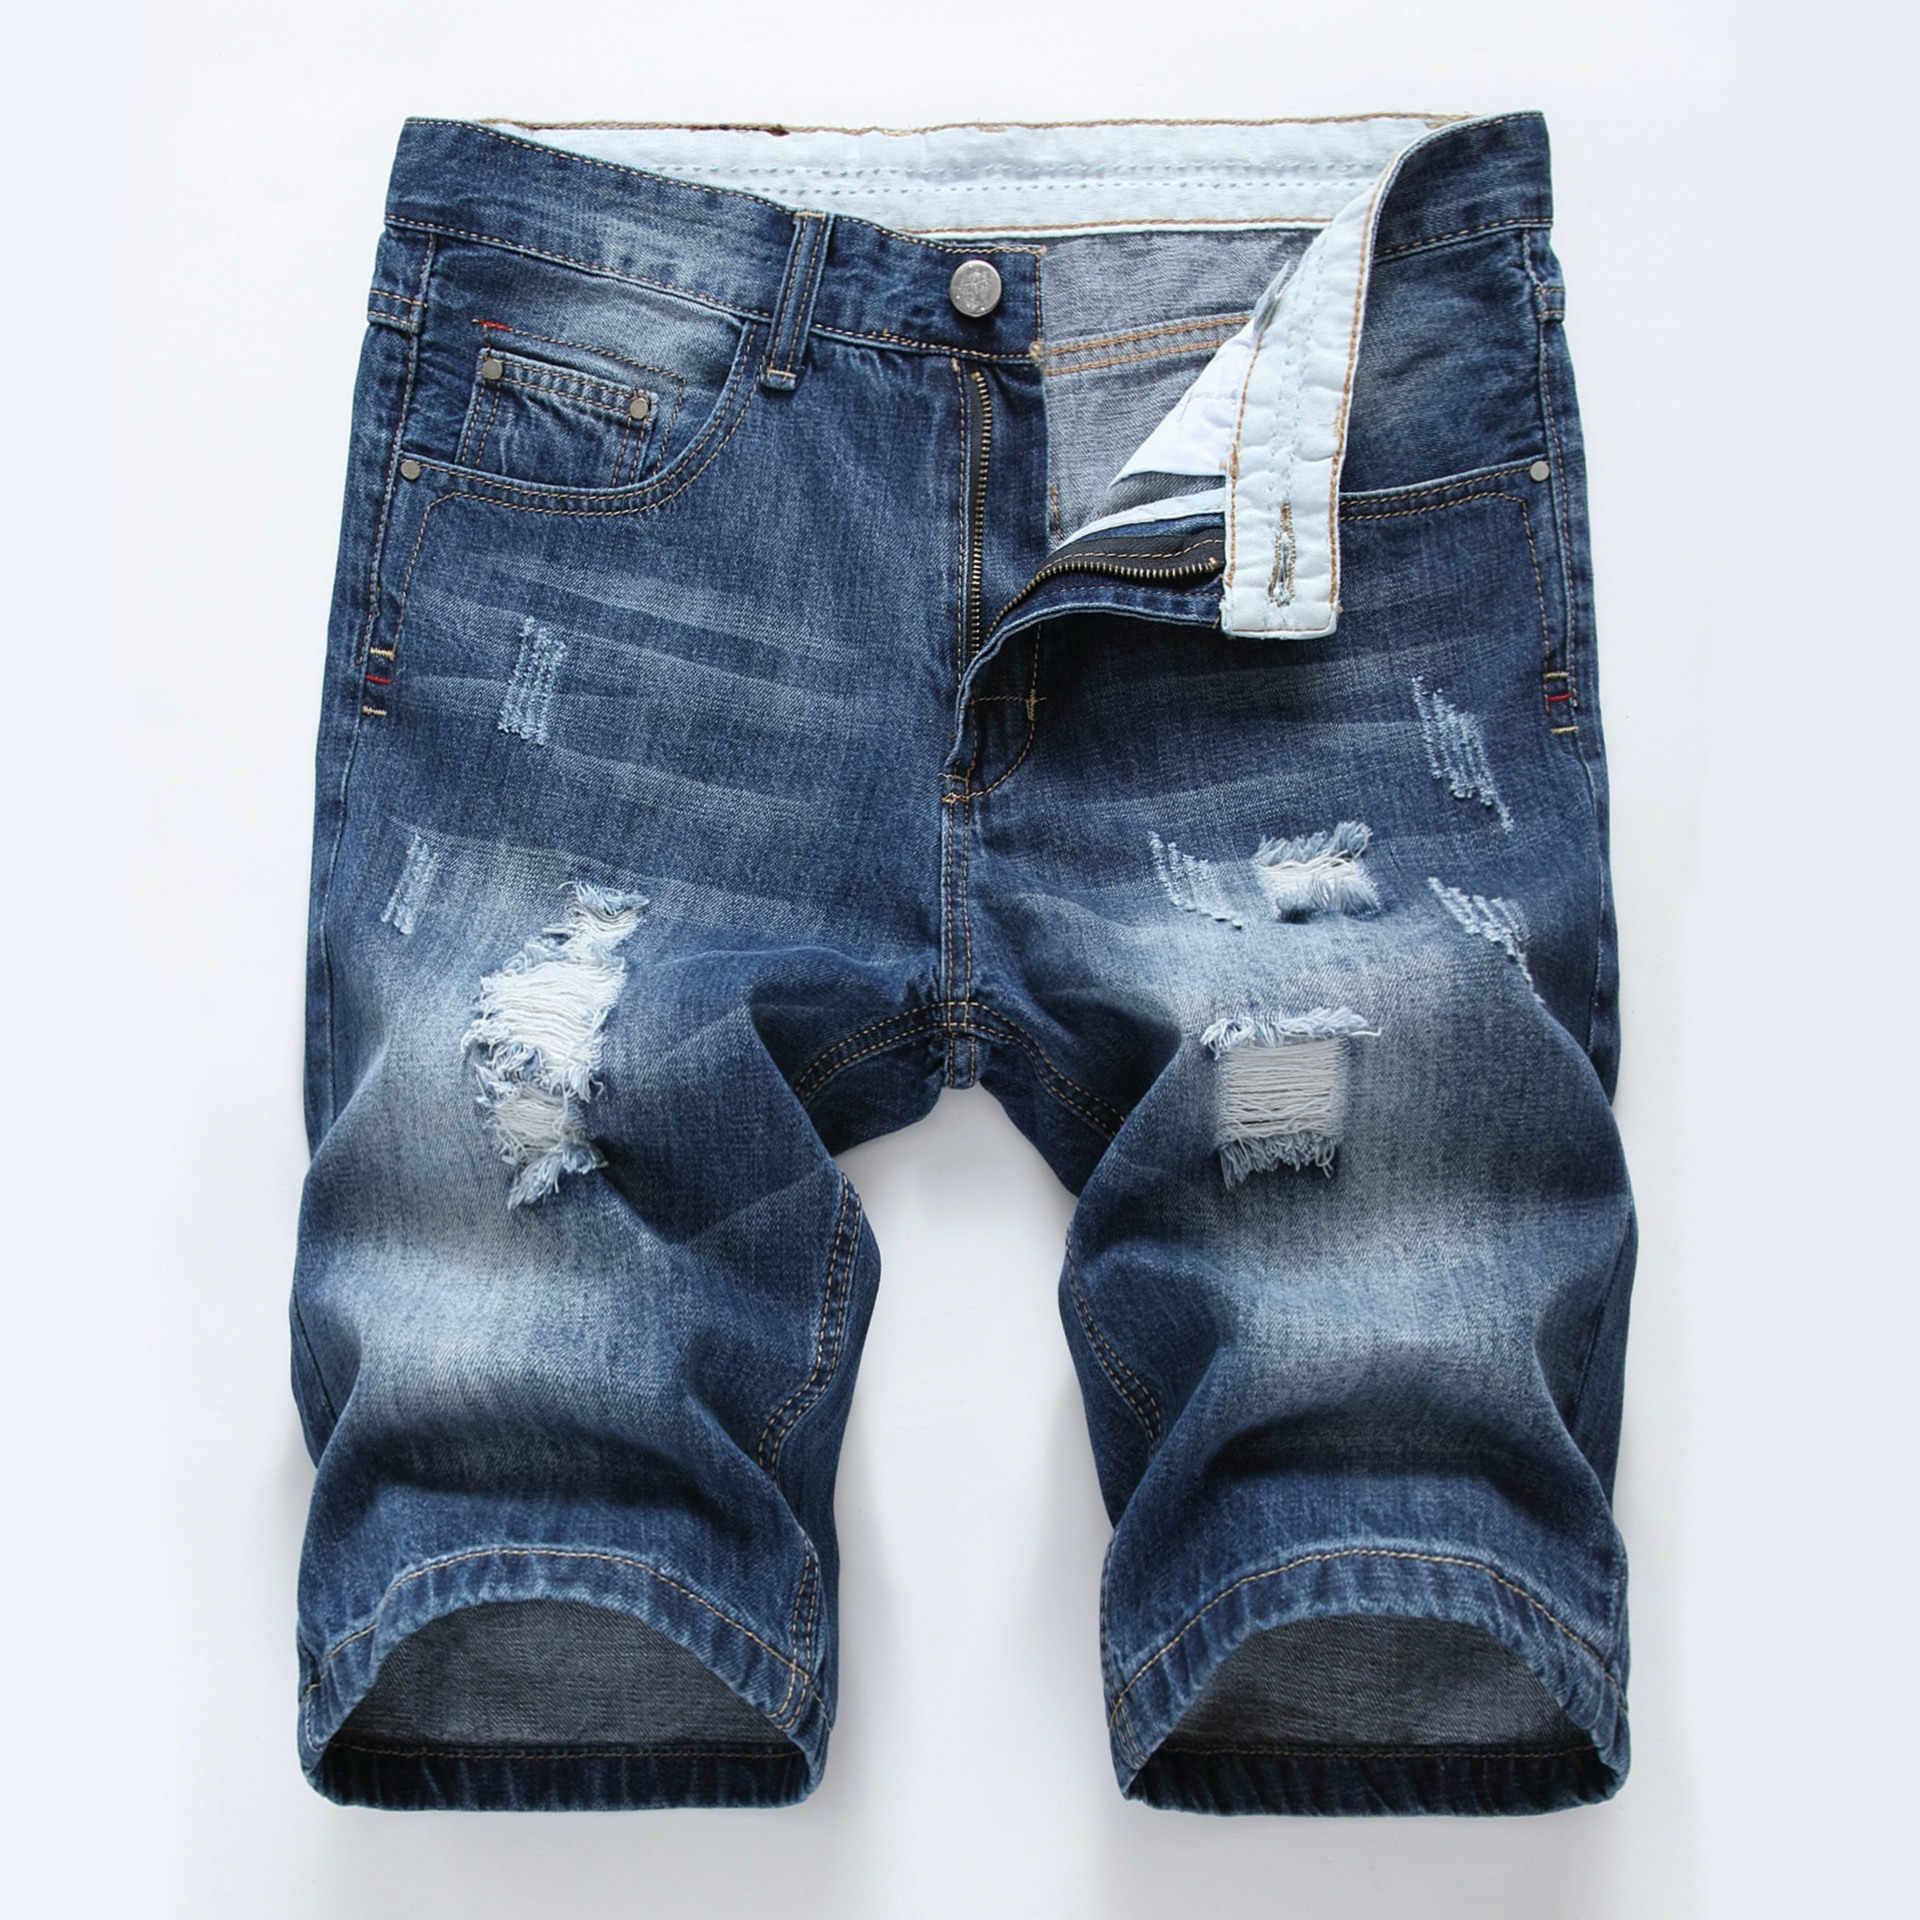 2c5718d647 ... Summer cotton hole denim shorts male ripped jeans retro men jean shorts  bermuda skate board harem ...